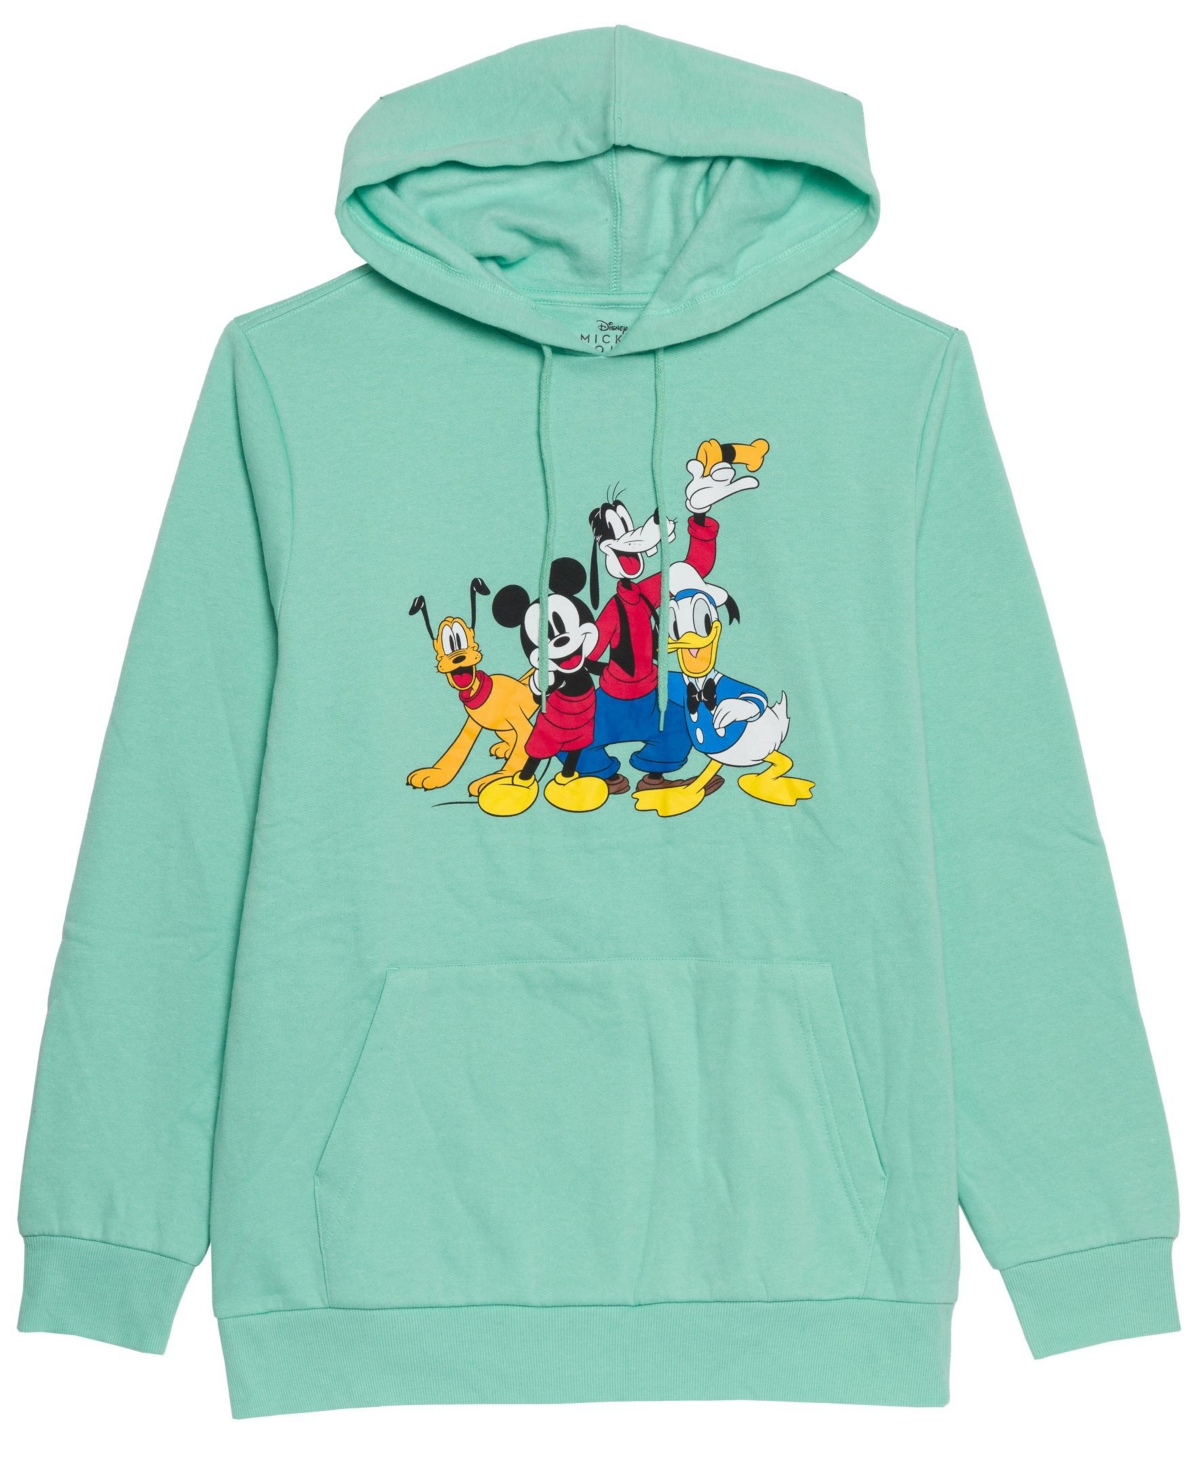 Men's Mickey and Friends Hooded Fleece Sweatshirt